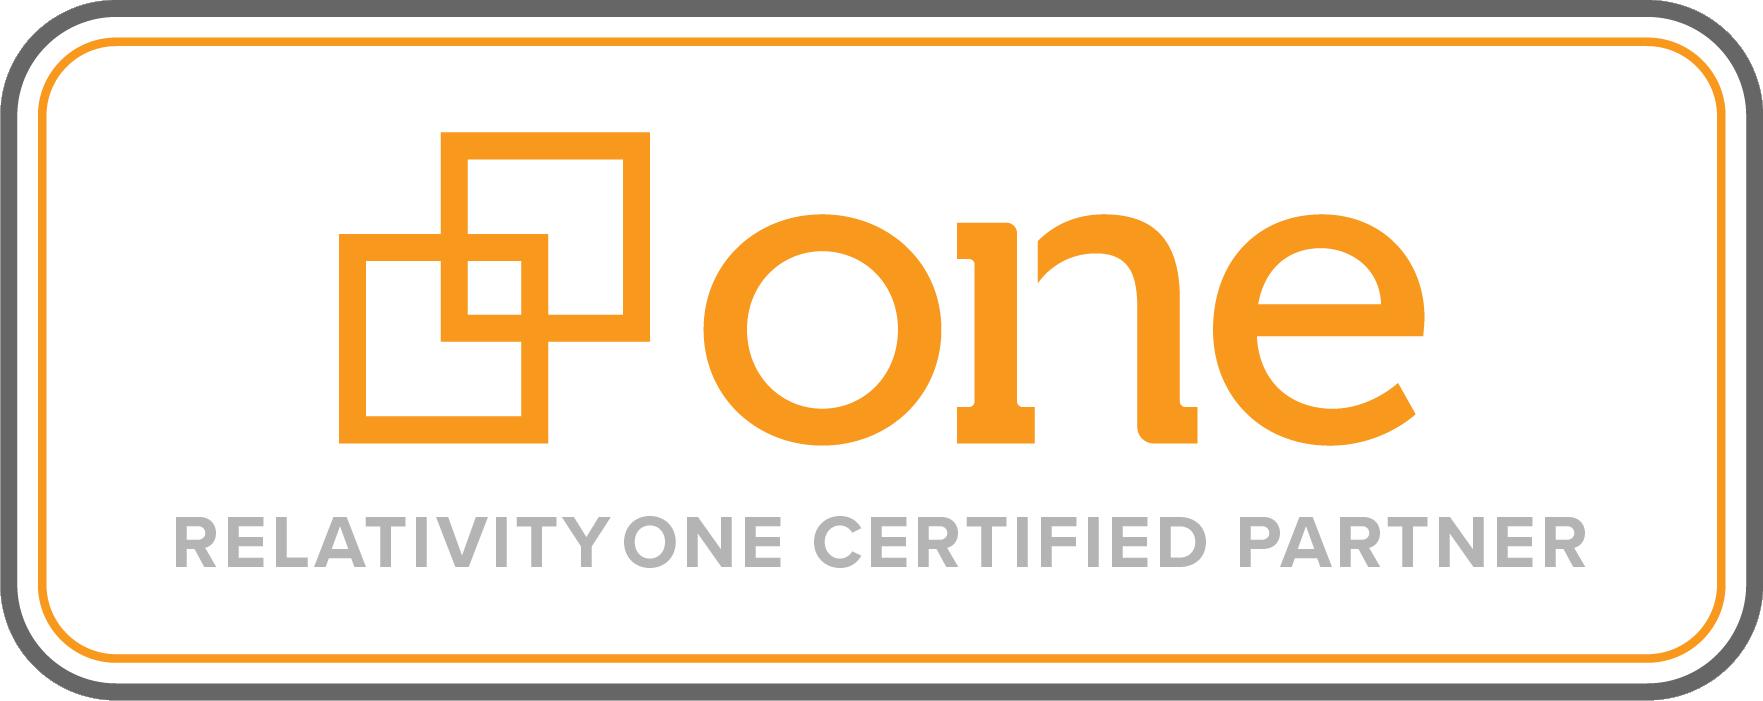 relativityone-certified-partner.png